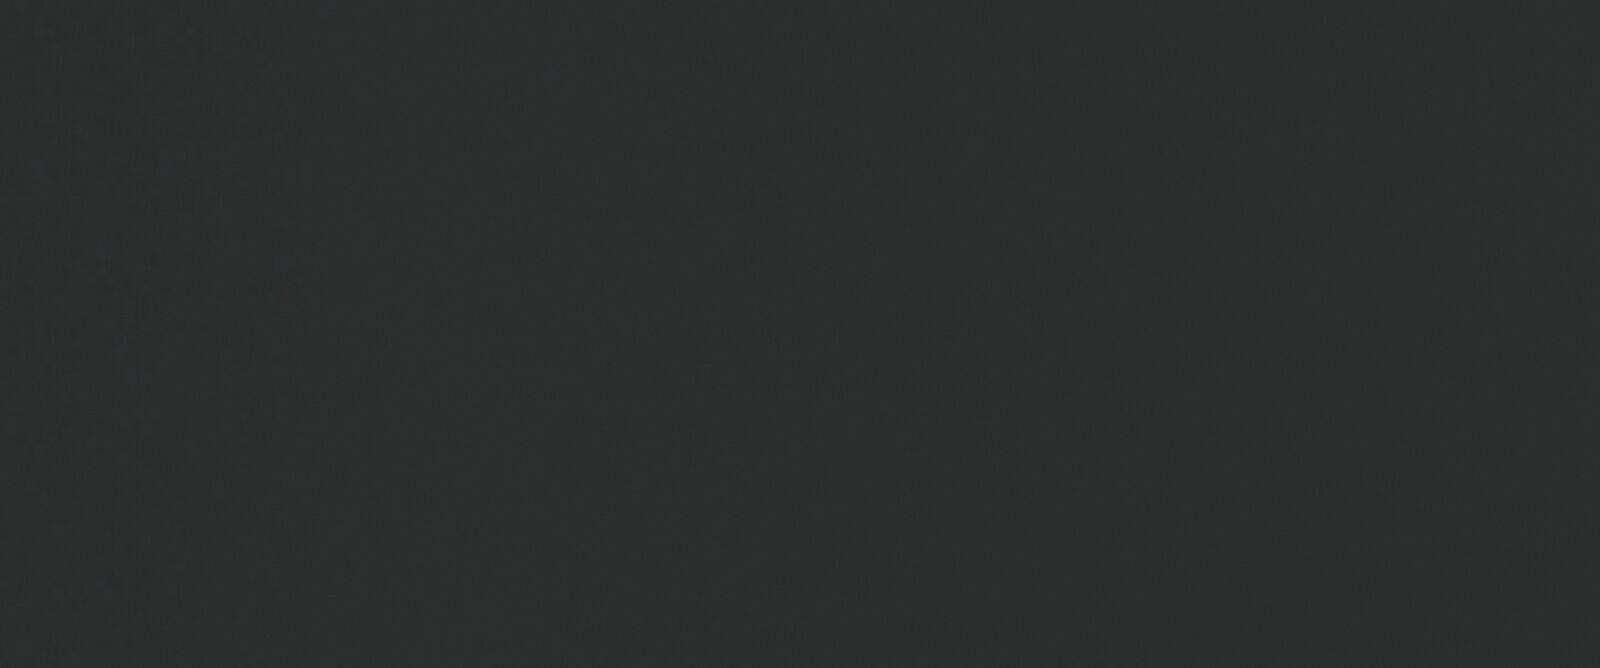 skai® schwarzgrau SFTN matt